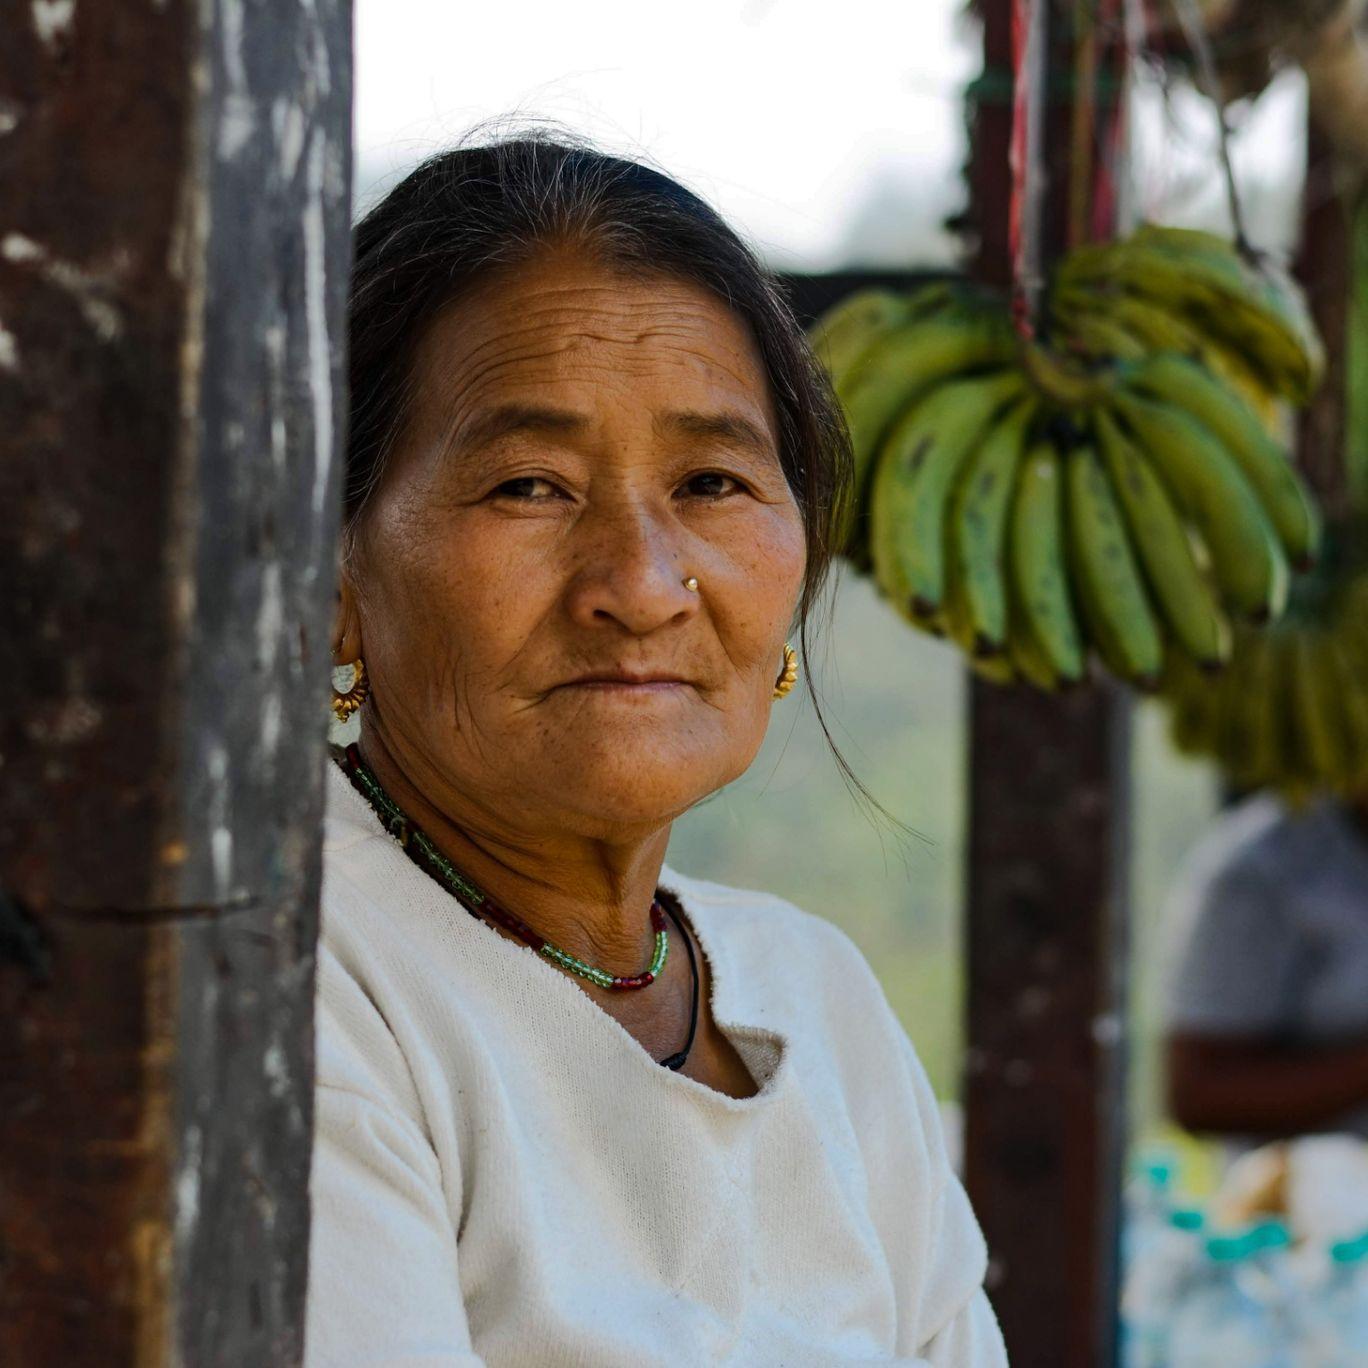 Photo of Bhutan By Mohamed Jamaluddin